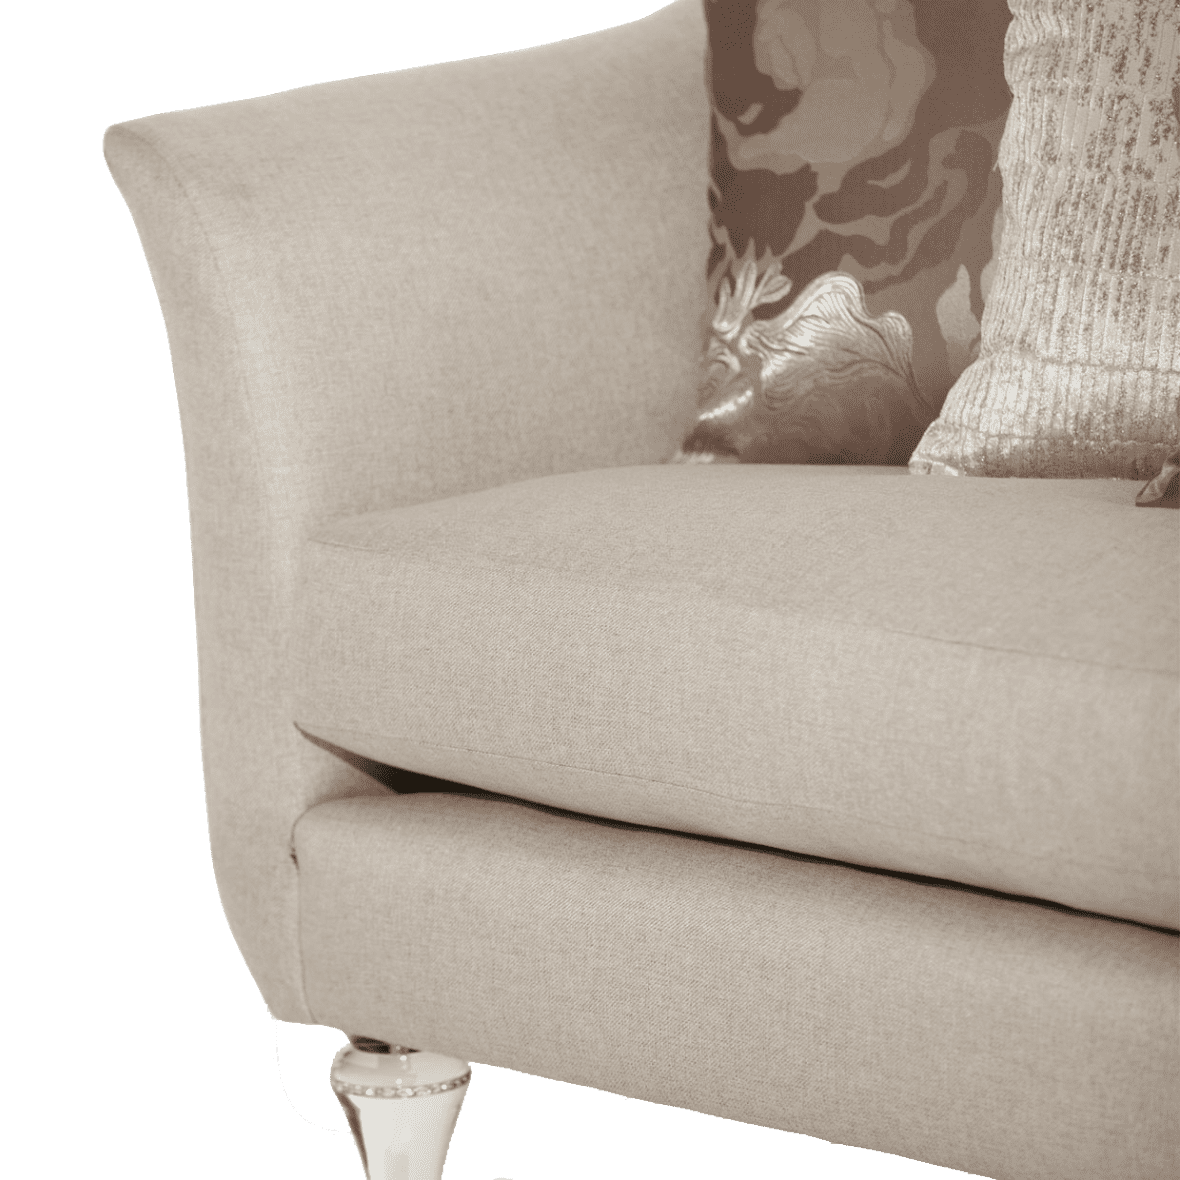 Софа стандарт Platinum, хрустальные ножки